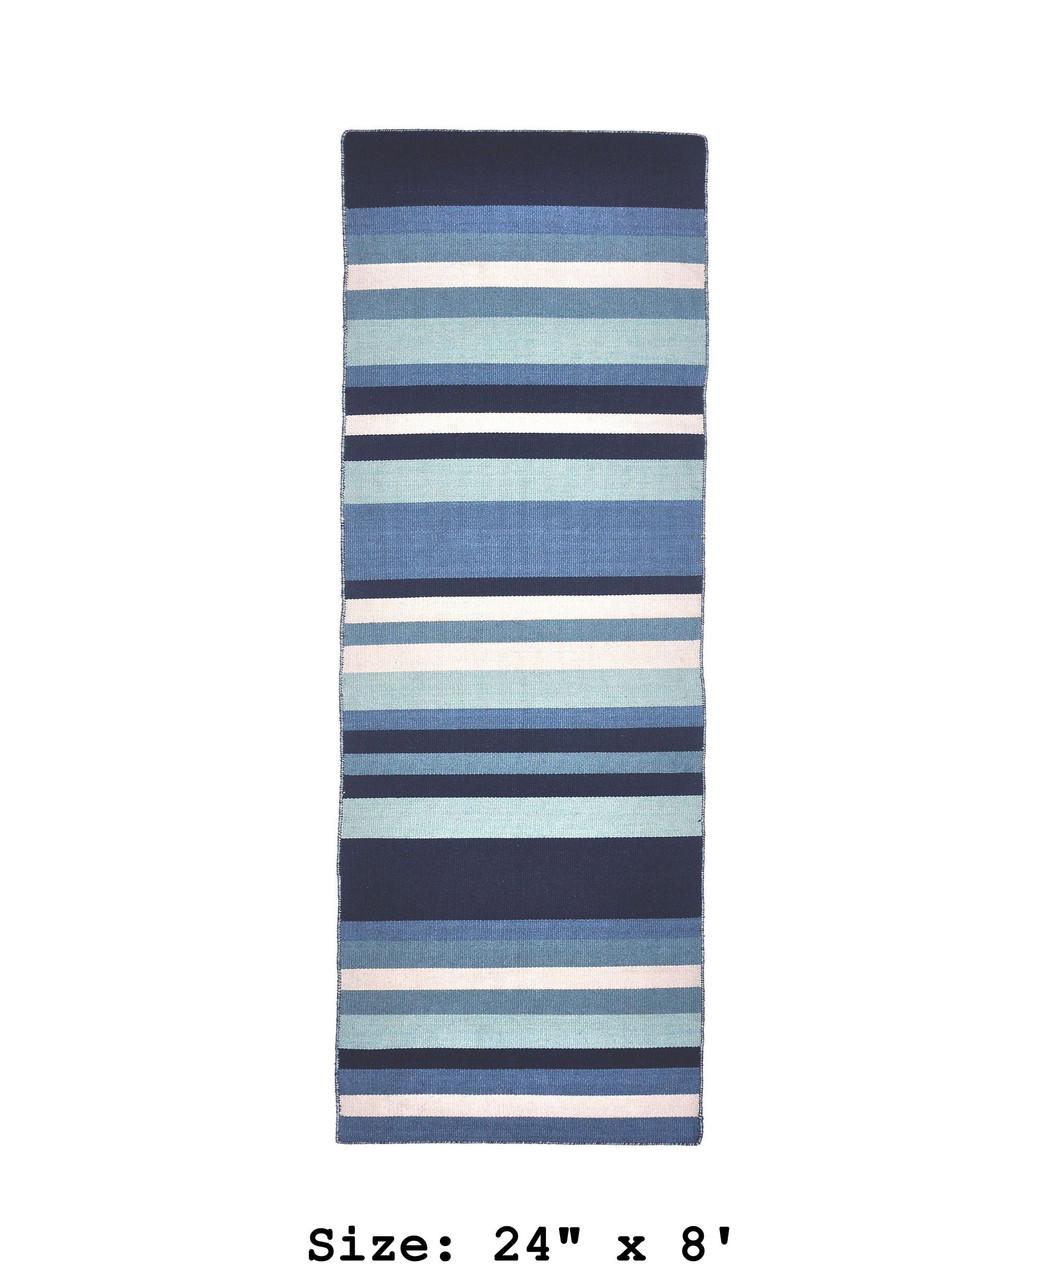 Blue Tribeca Stripes Indoor/Outdoor Rug - Runner